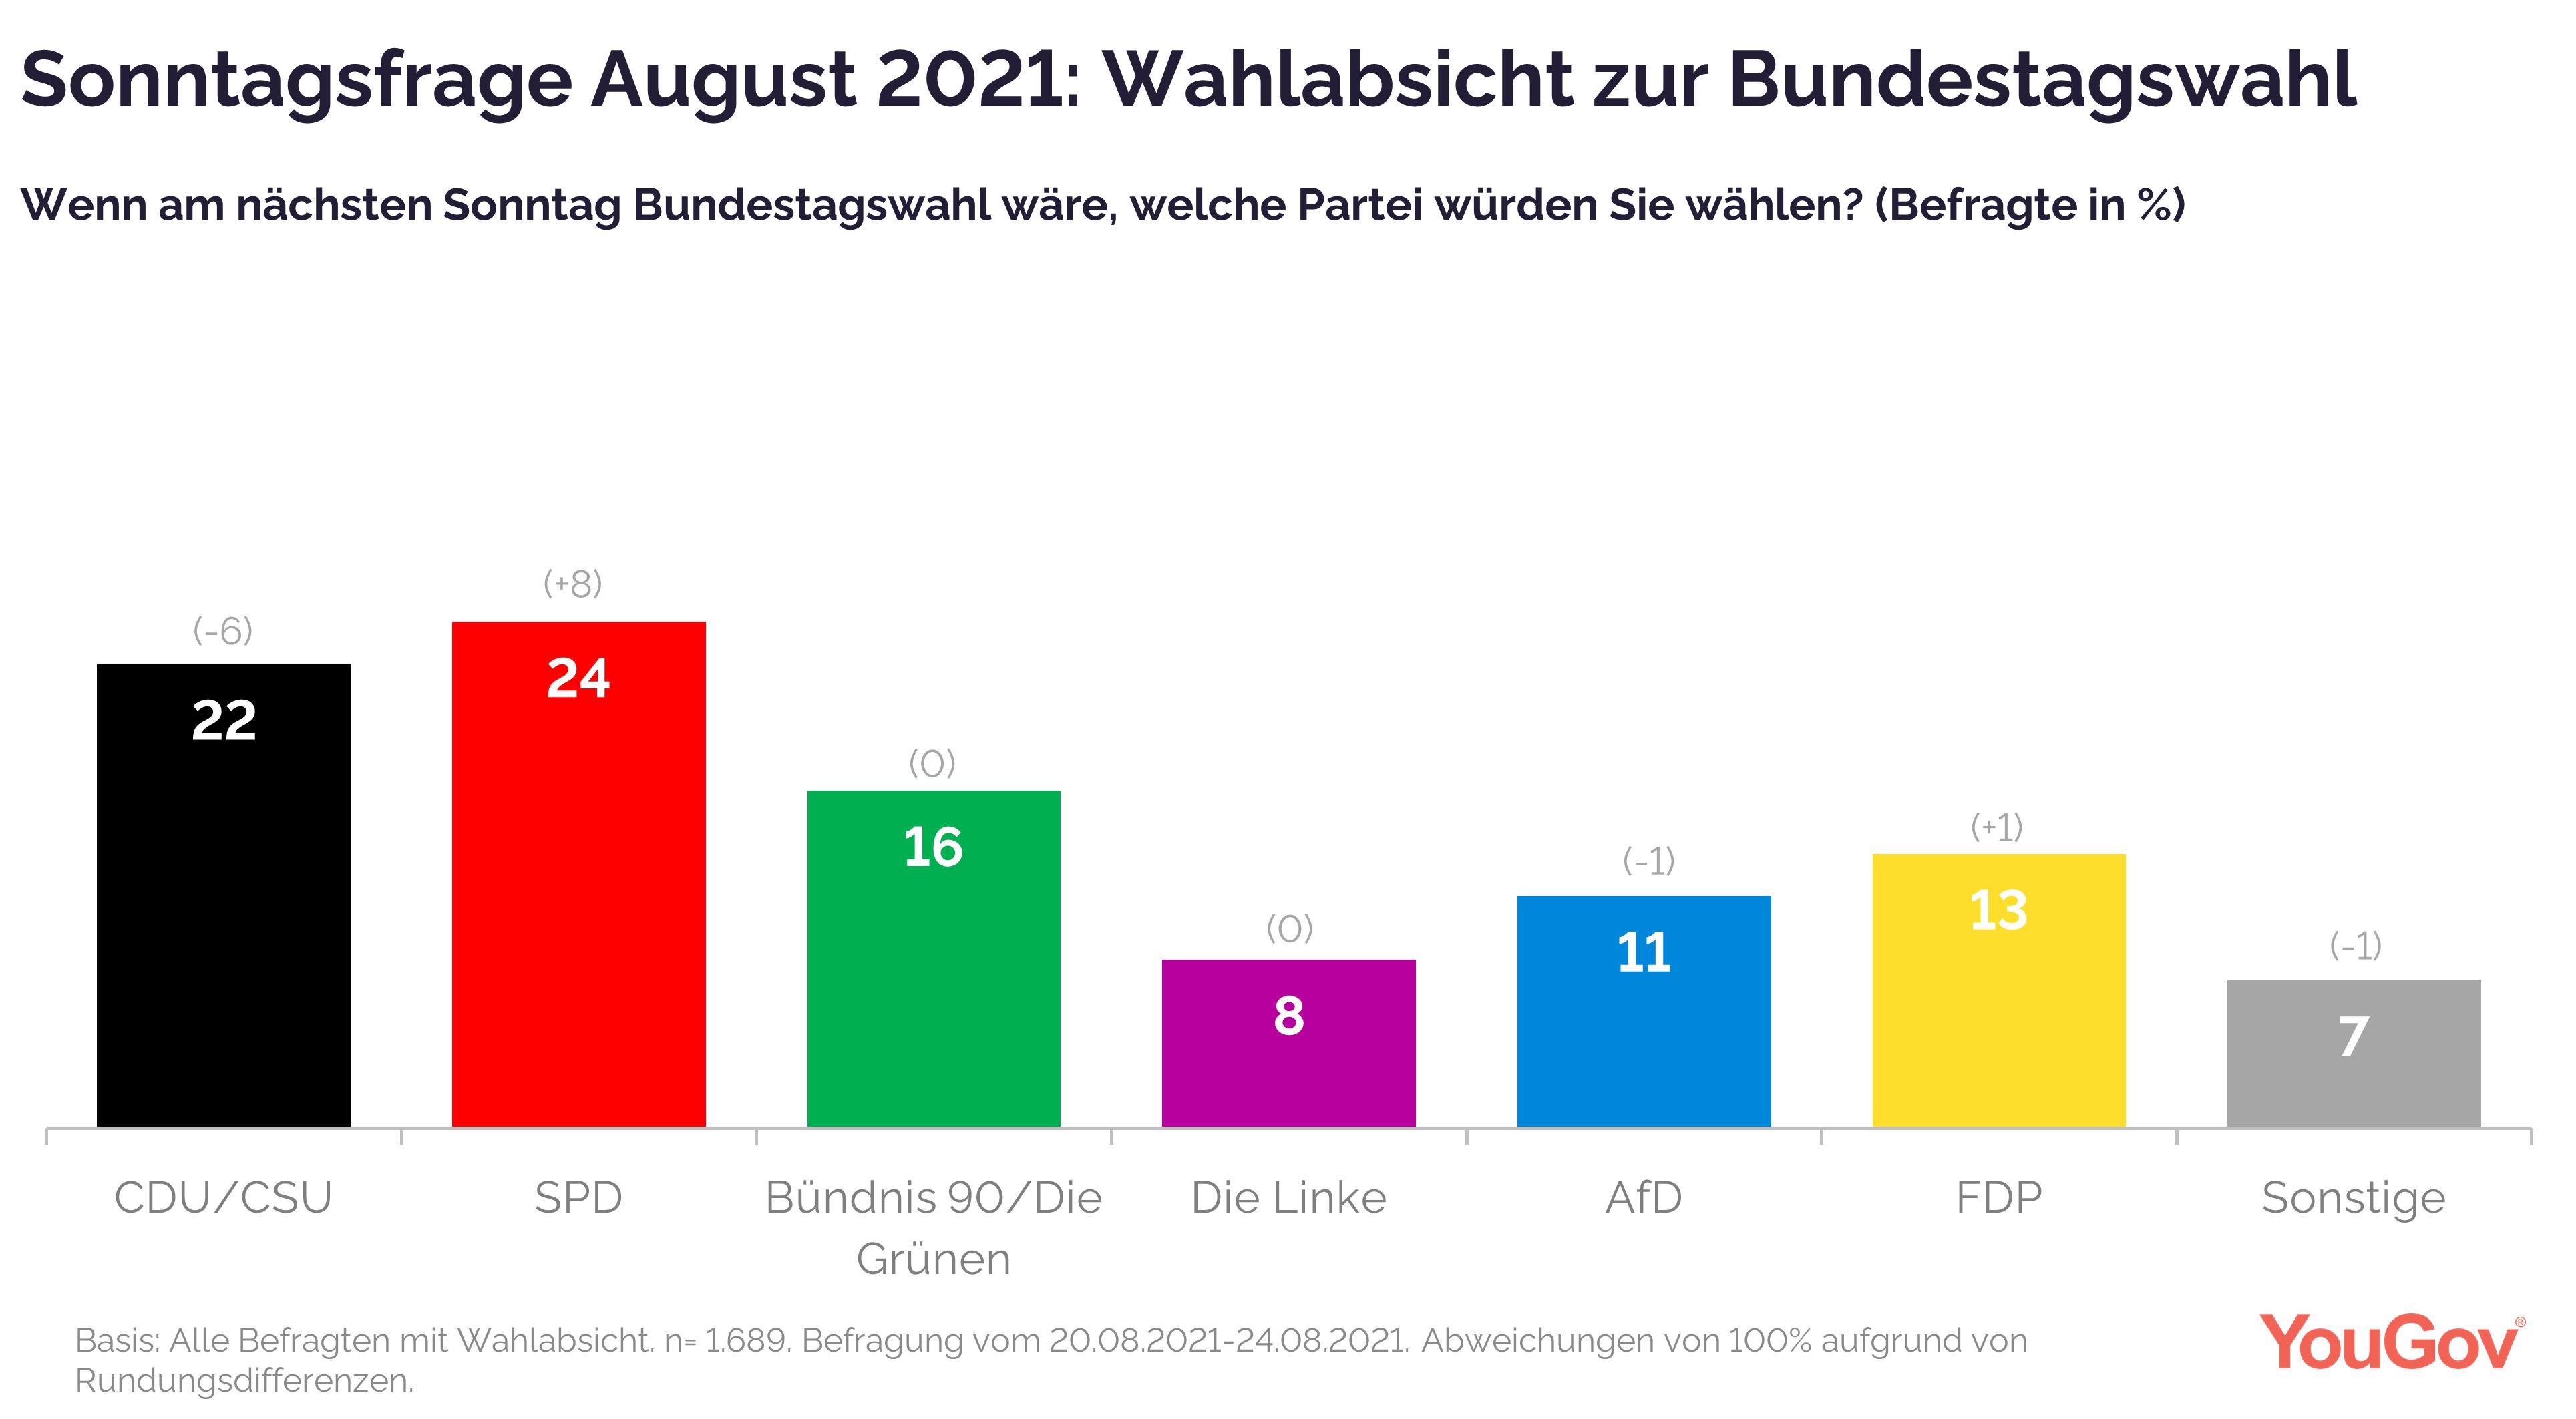 Wahlabsicht August